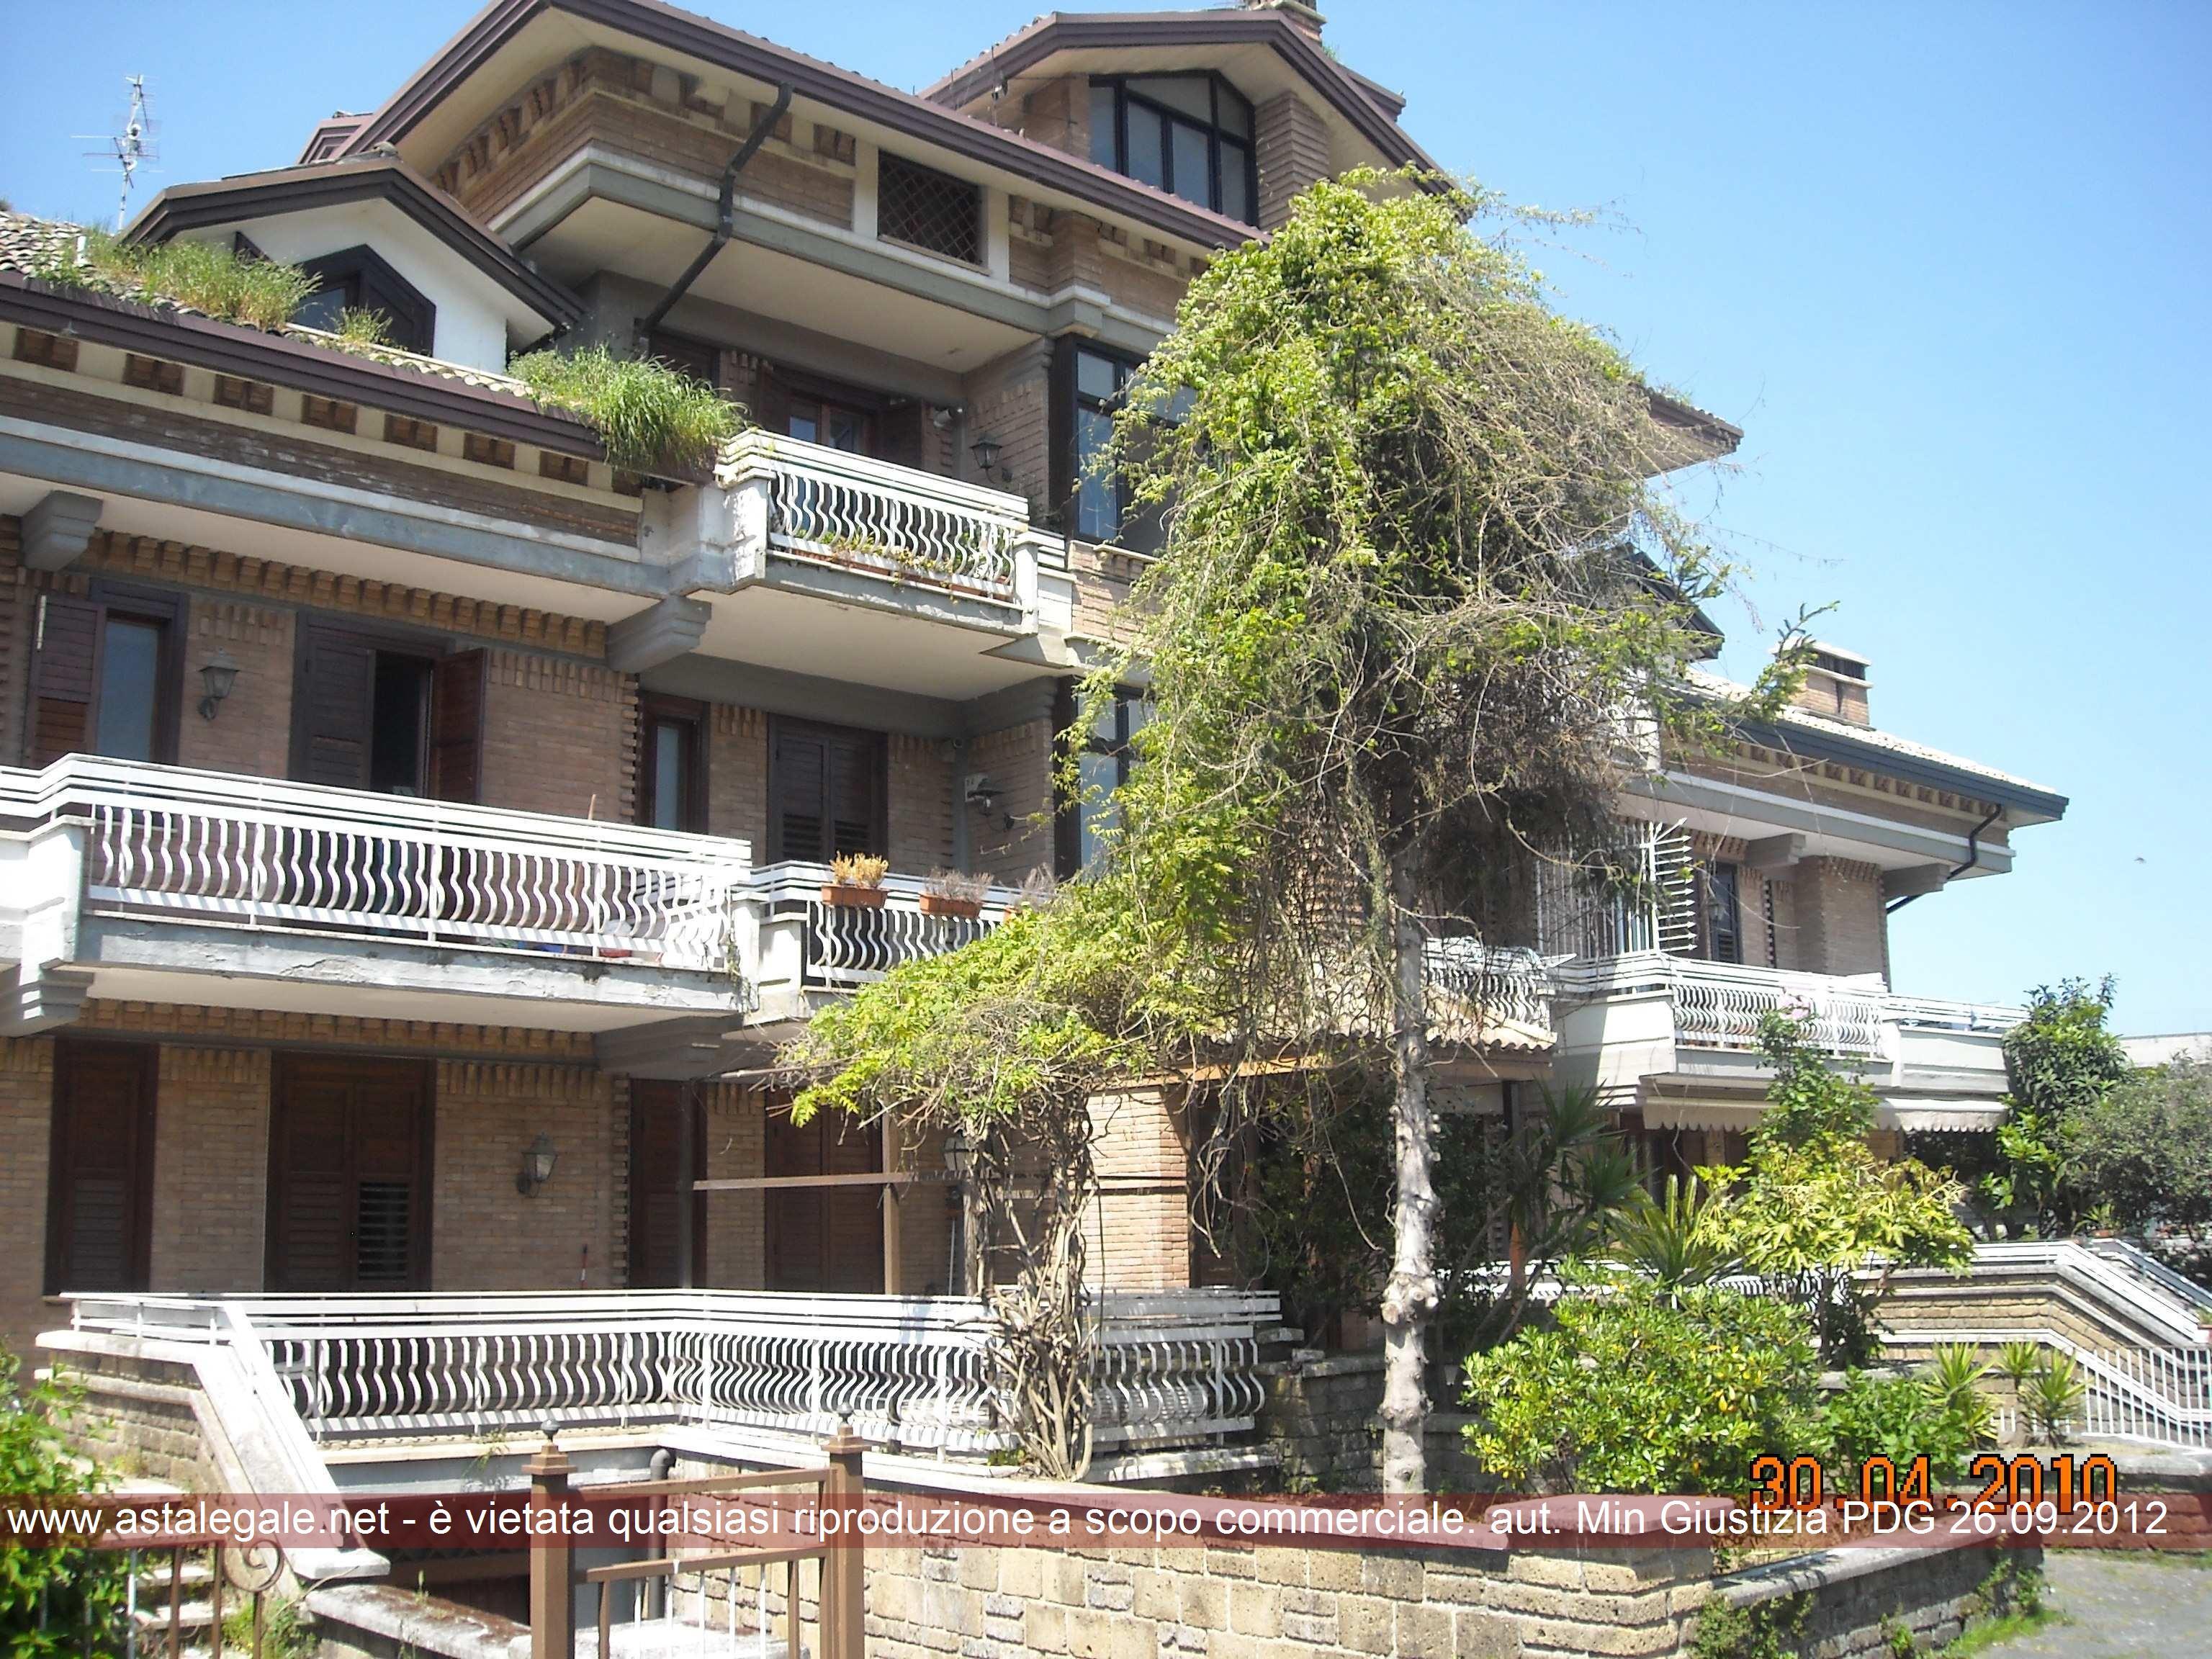 Avellino (AV) Via Sinibaldo Tino 1